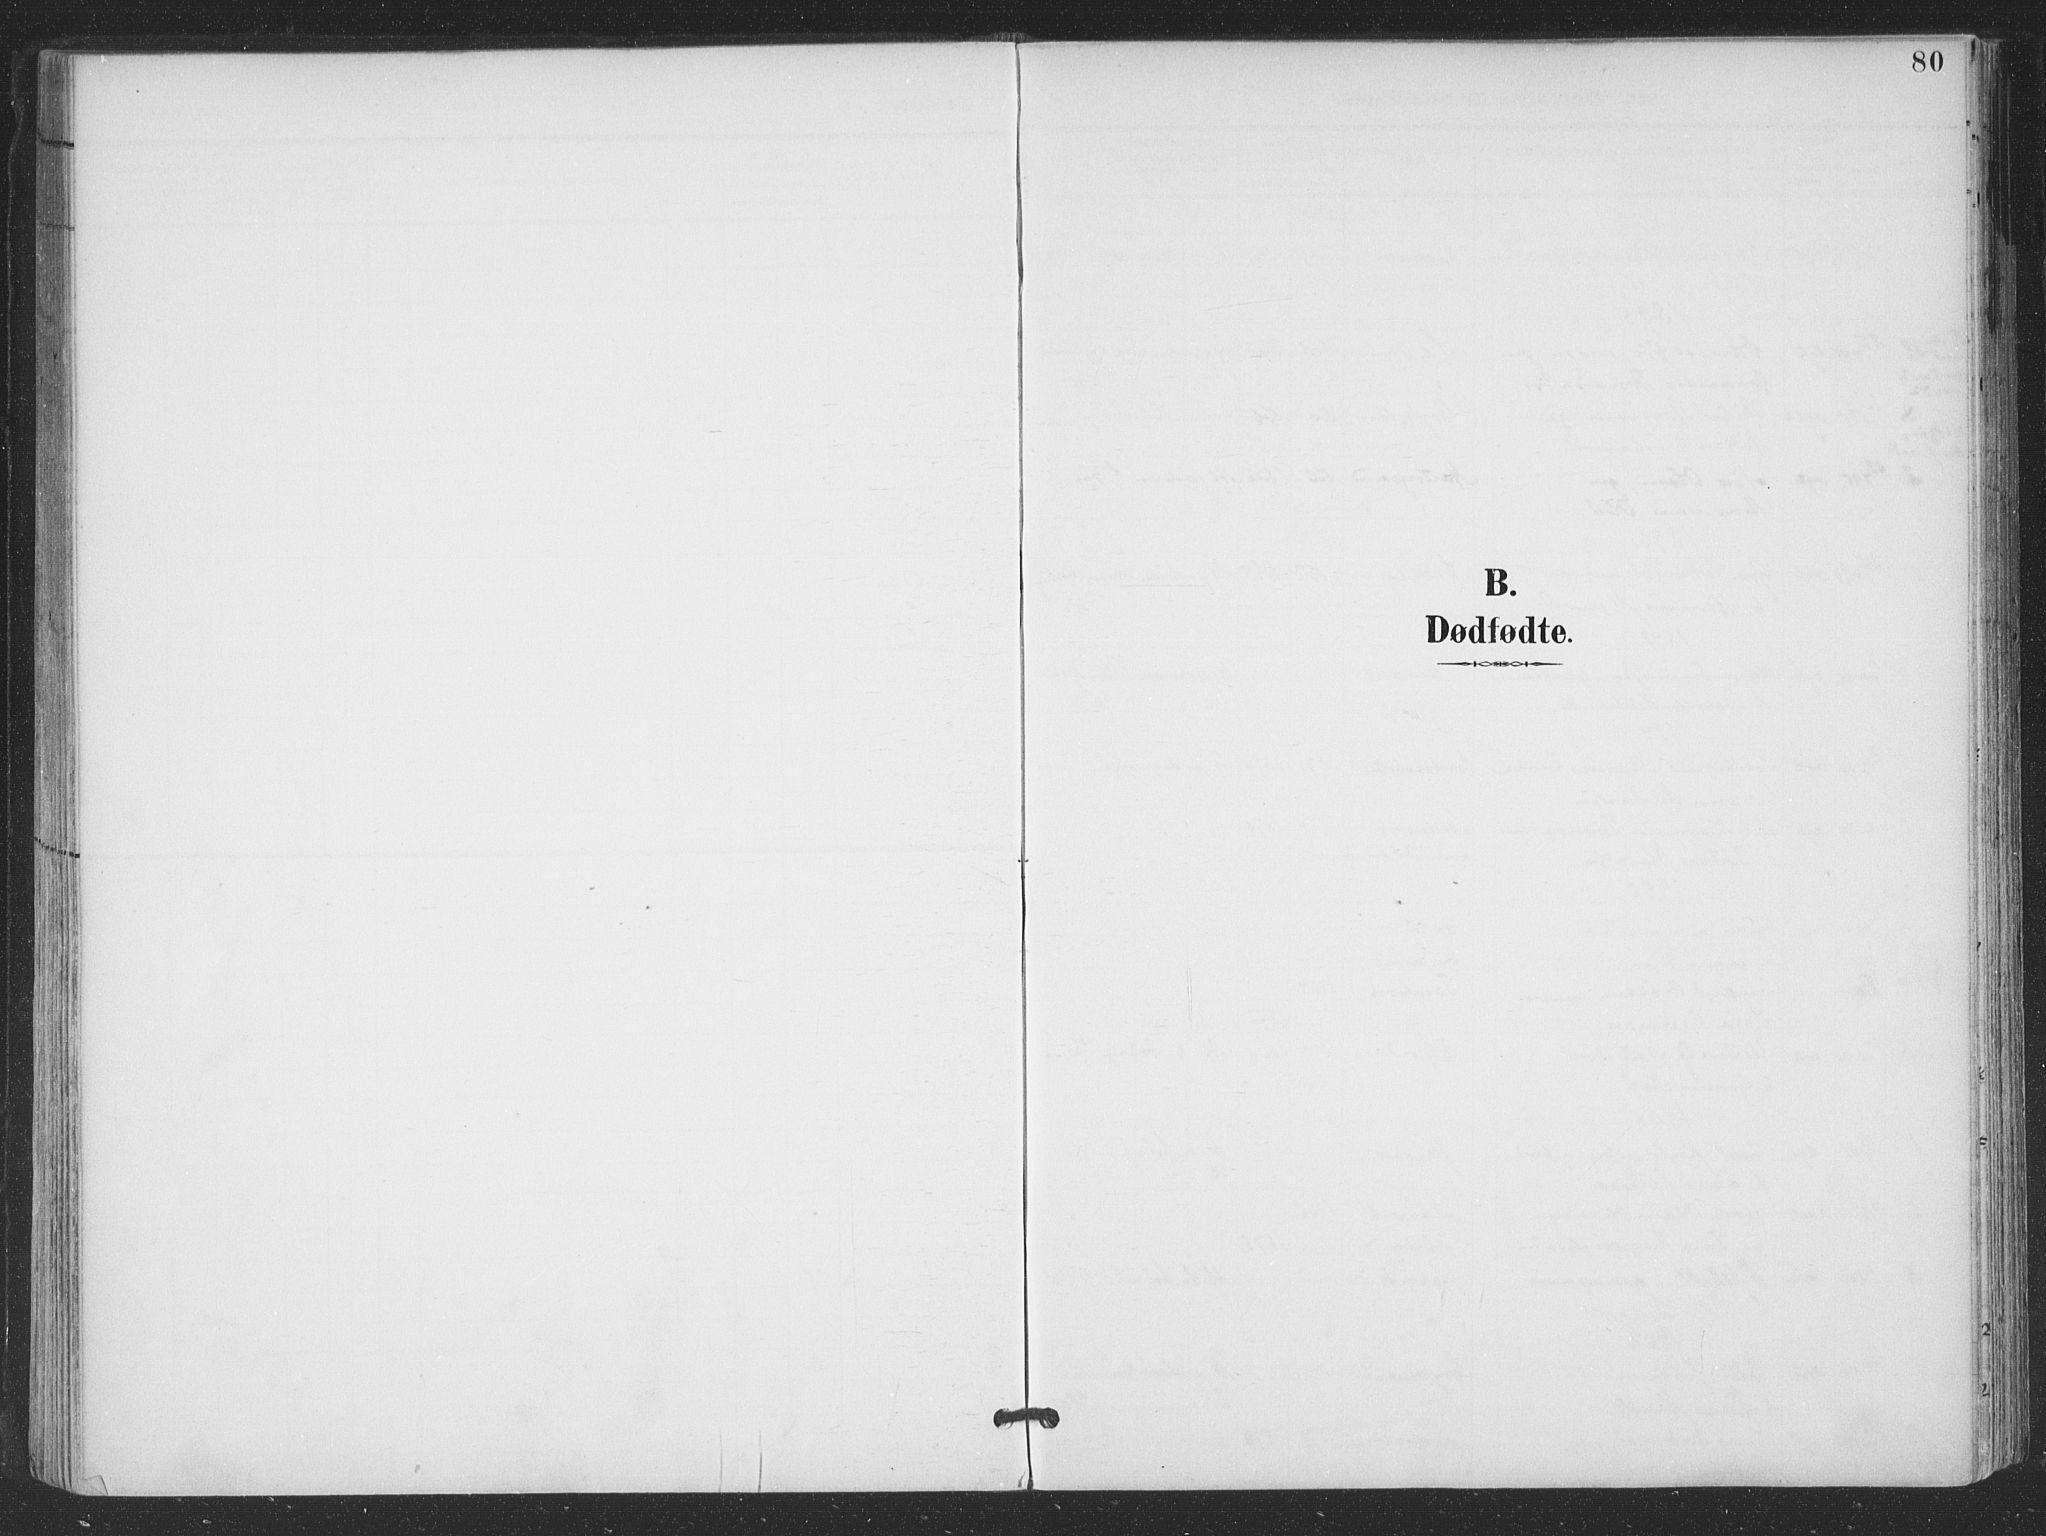 SAT, Ministerialprotokoller, klokkerbøker og fødselsregistre - Nordland, 866/L0939: Ministerialbok nr. 866A02, 1894-1906, s. 80